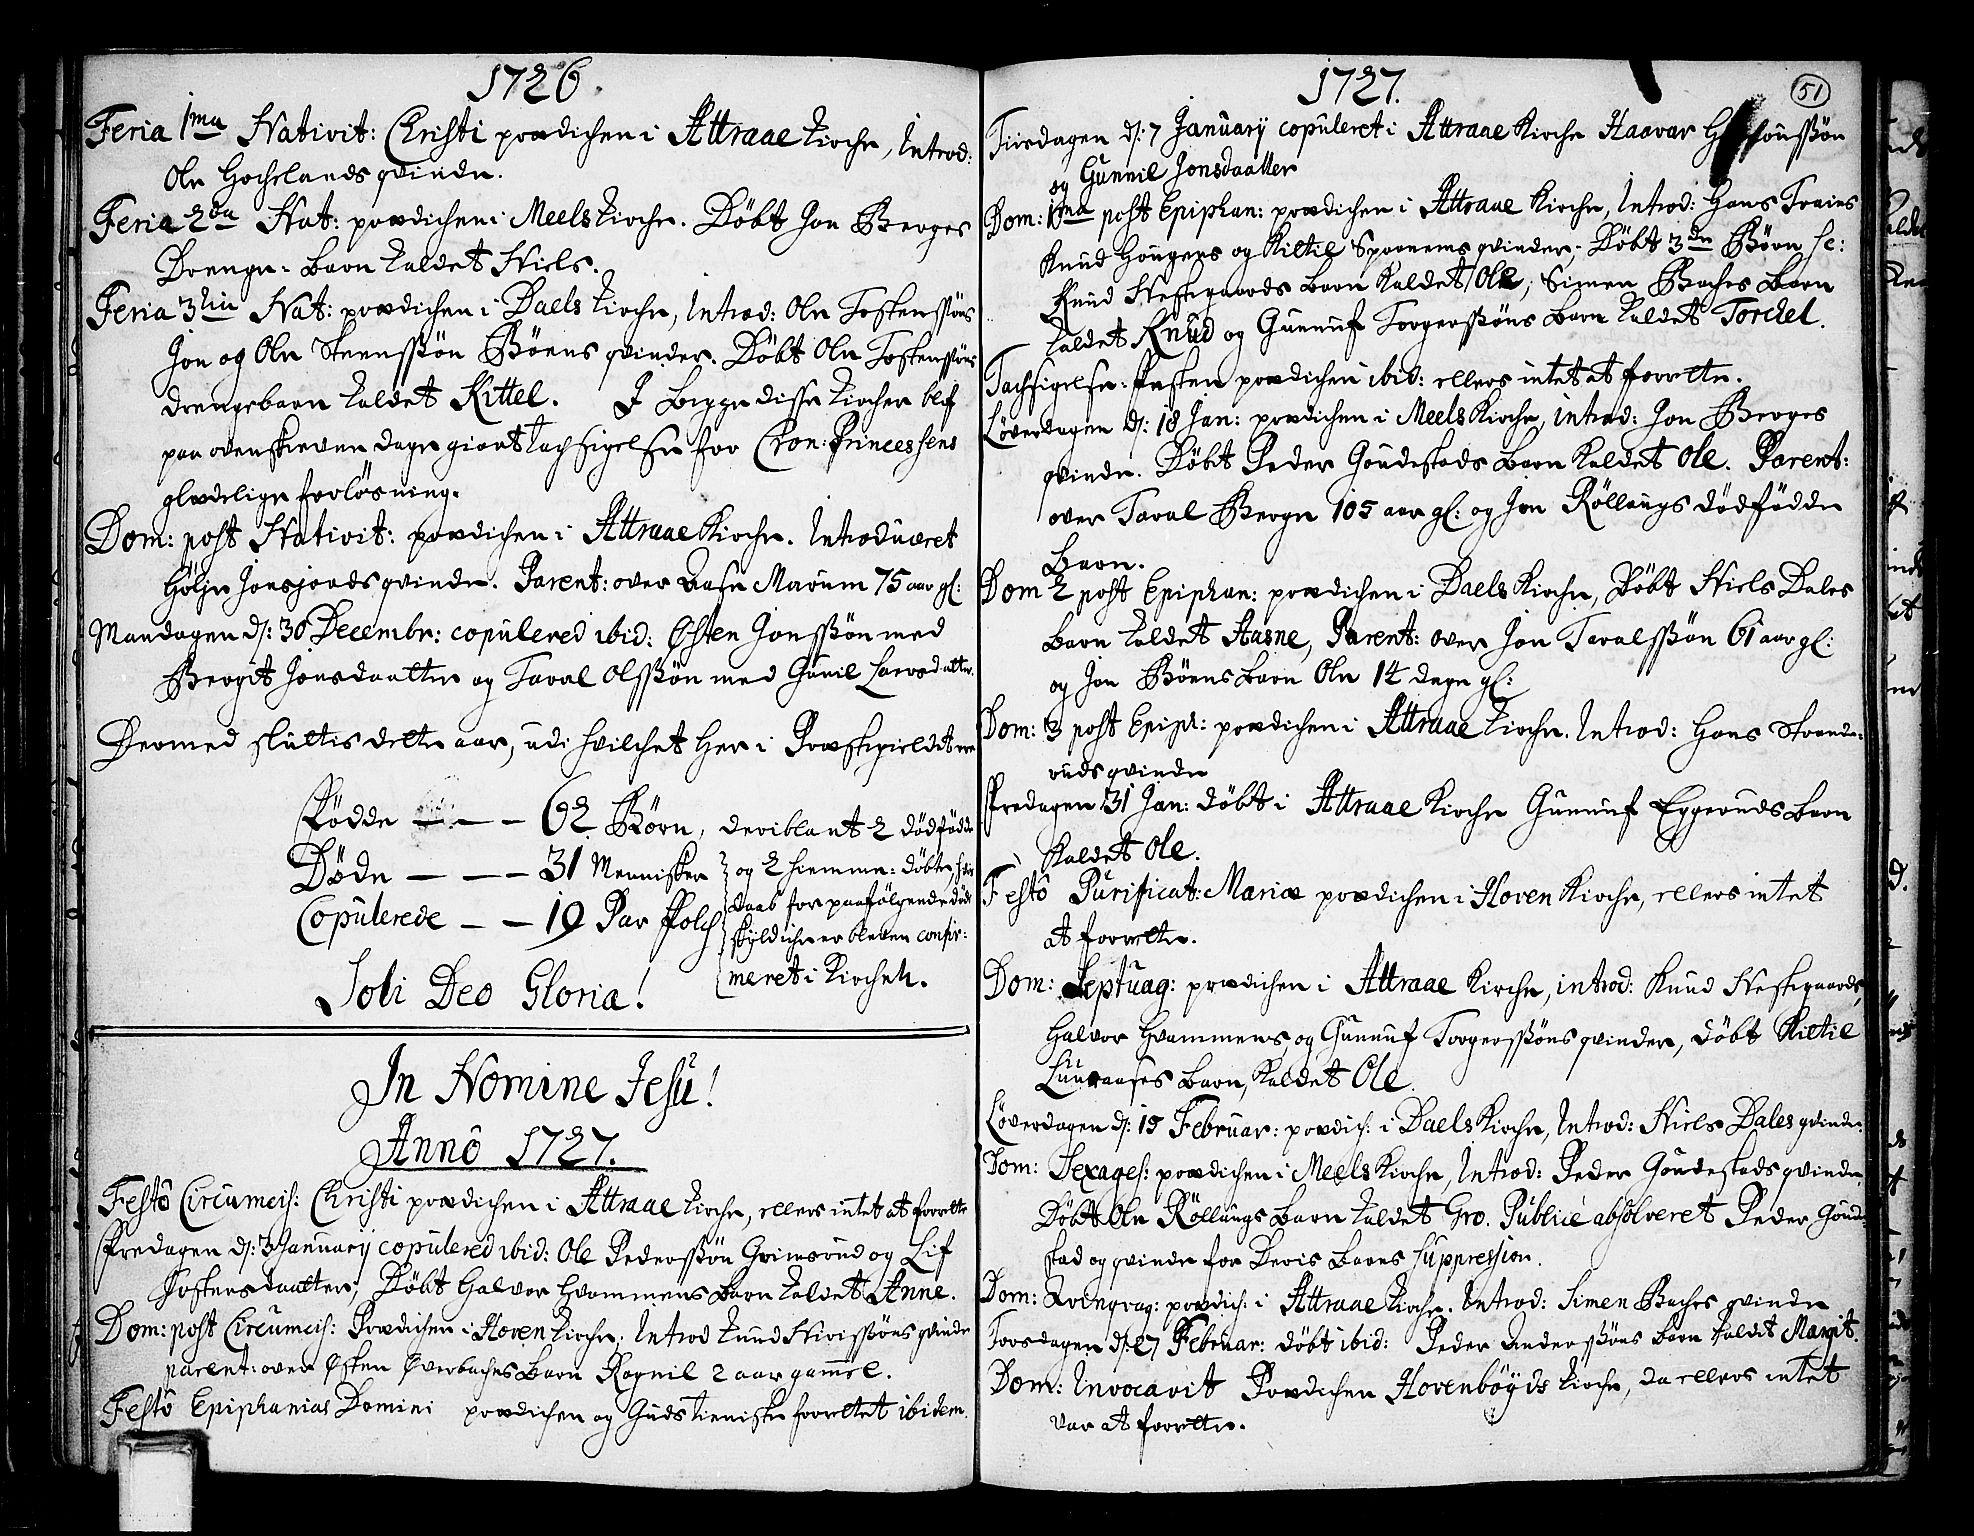 SAKO, Tinn kirkebøker, F/Fa/L0001: Ministerialbok nr. I 1, 1717-1734, s. 51